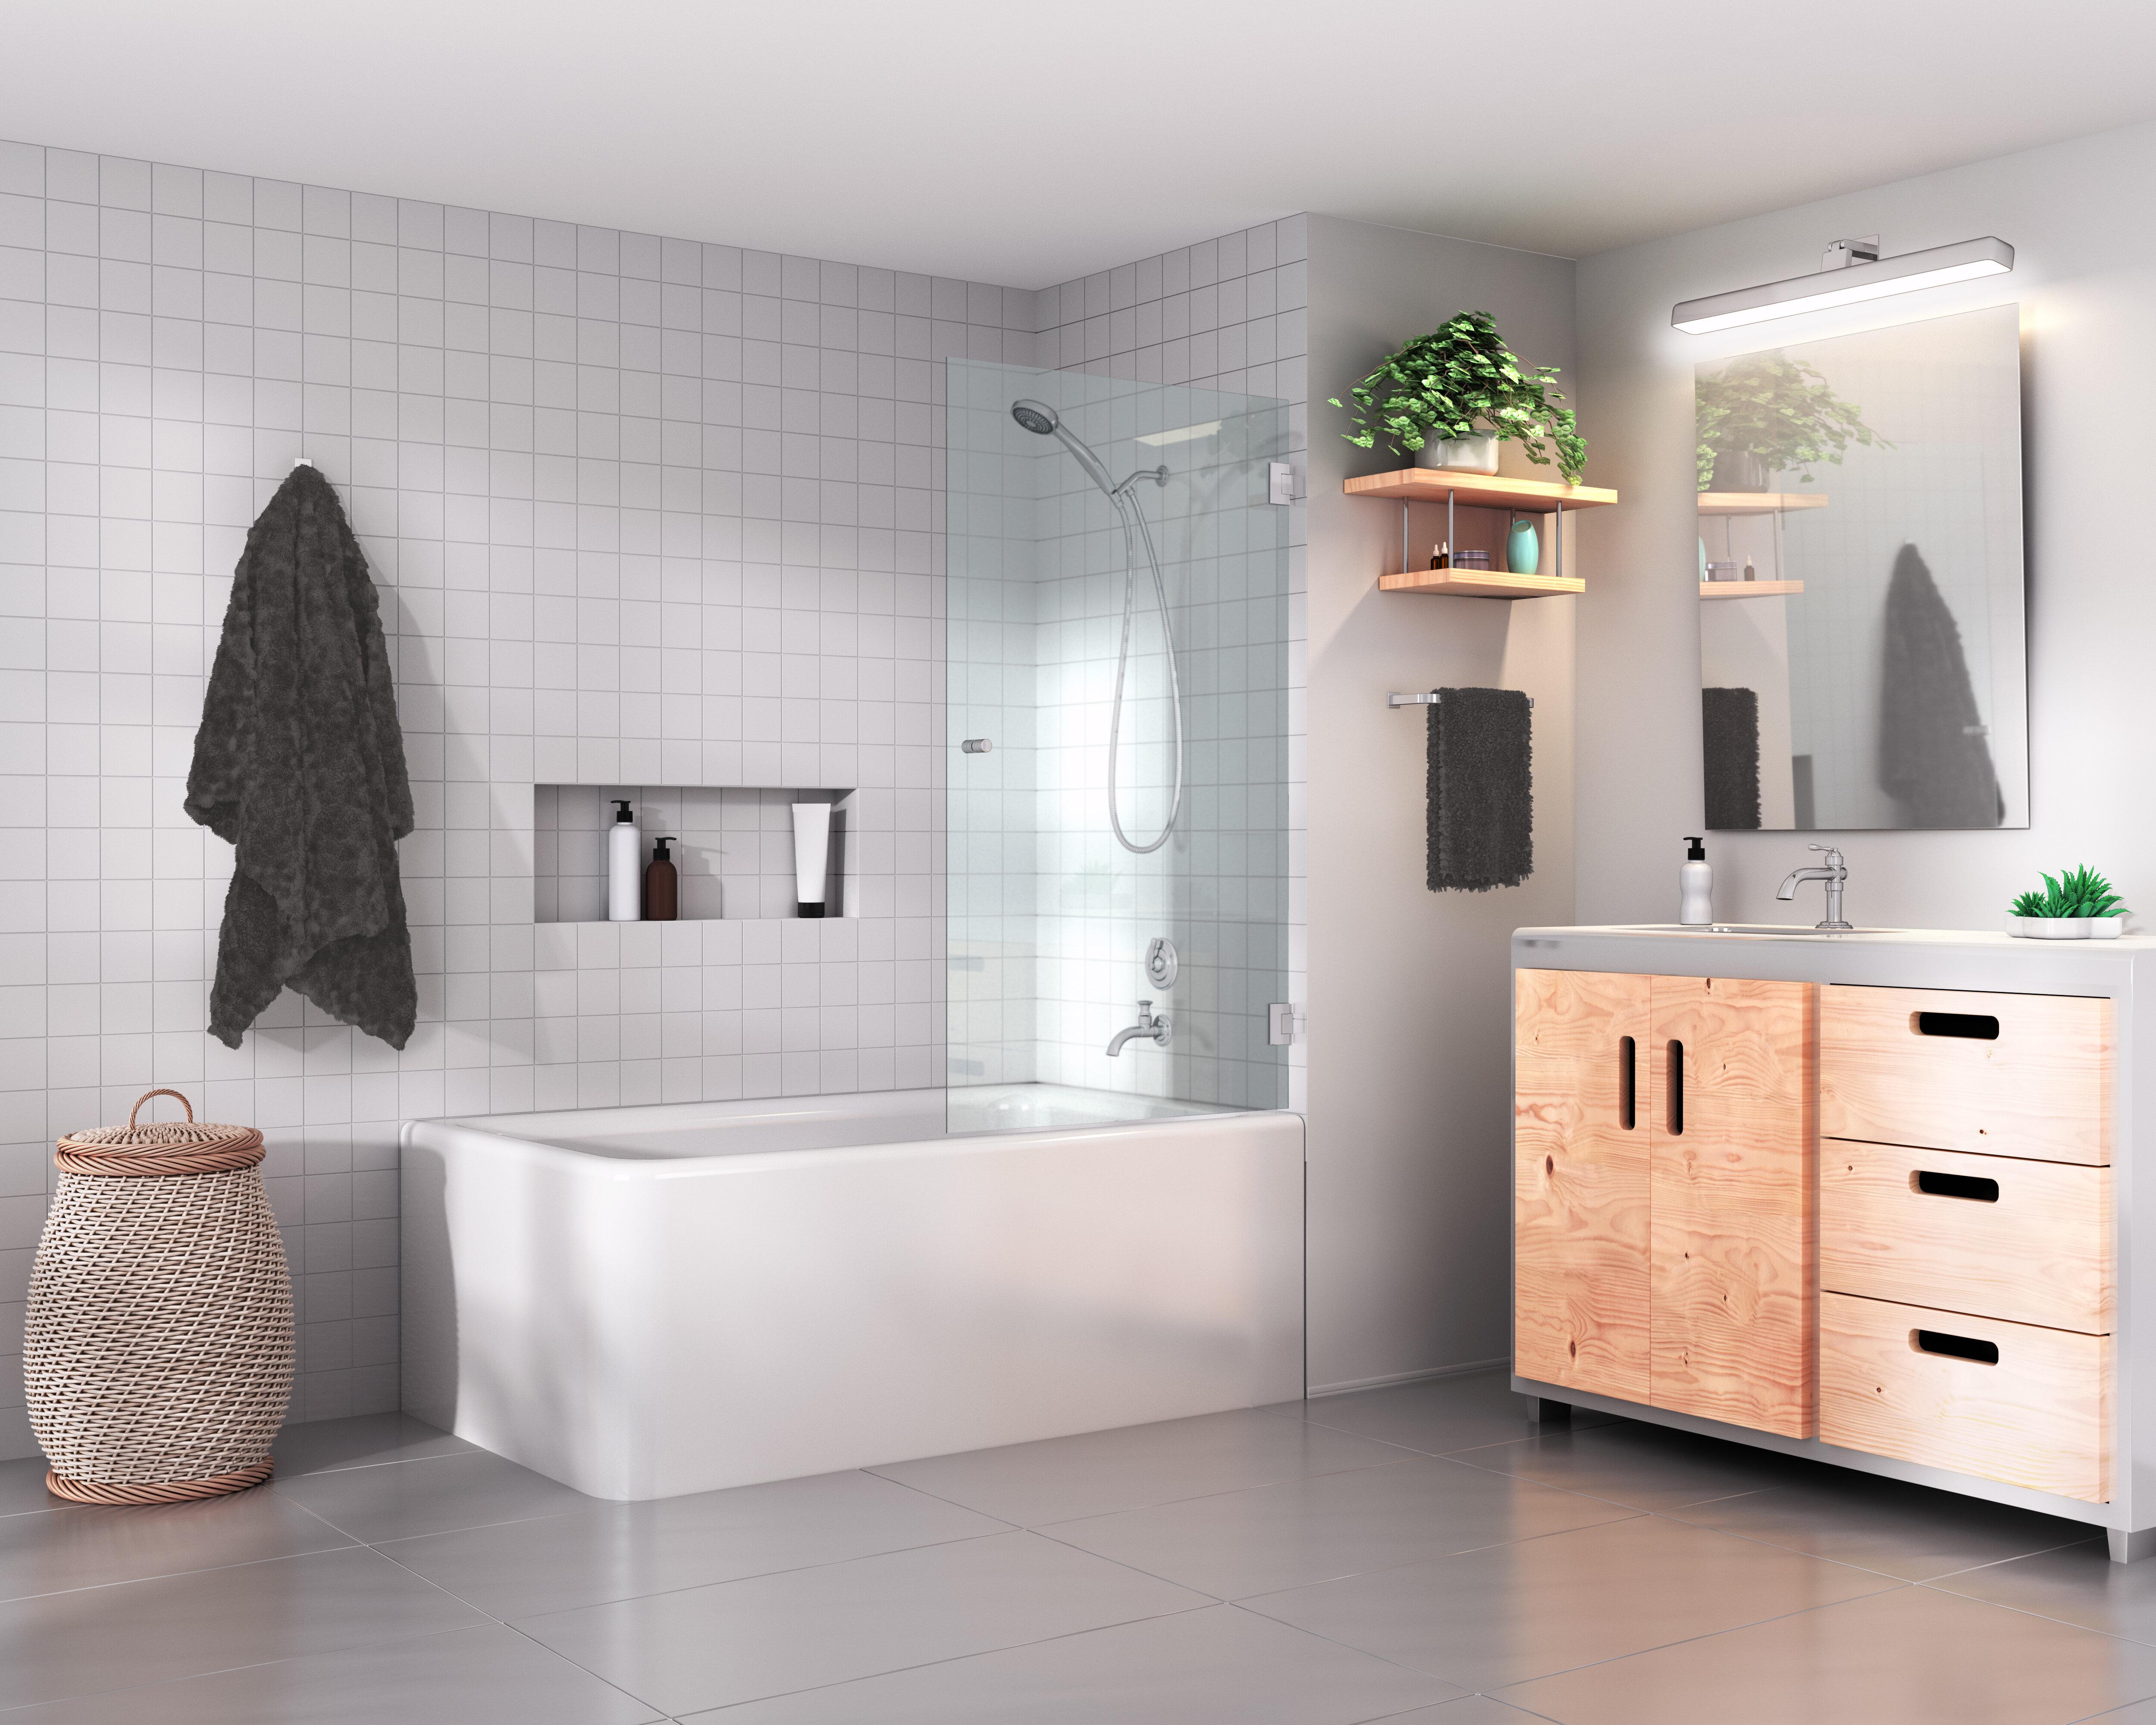 14 Simply Stunning Bathroom Shower Ideas With Photos